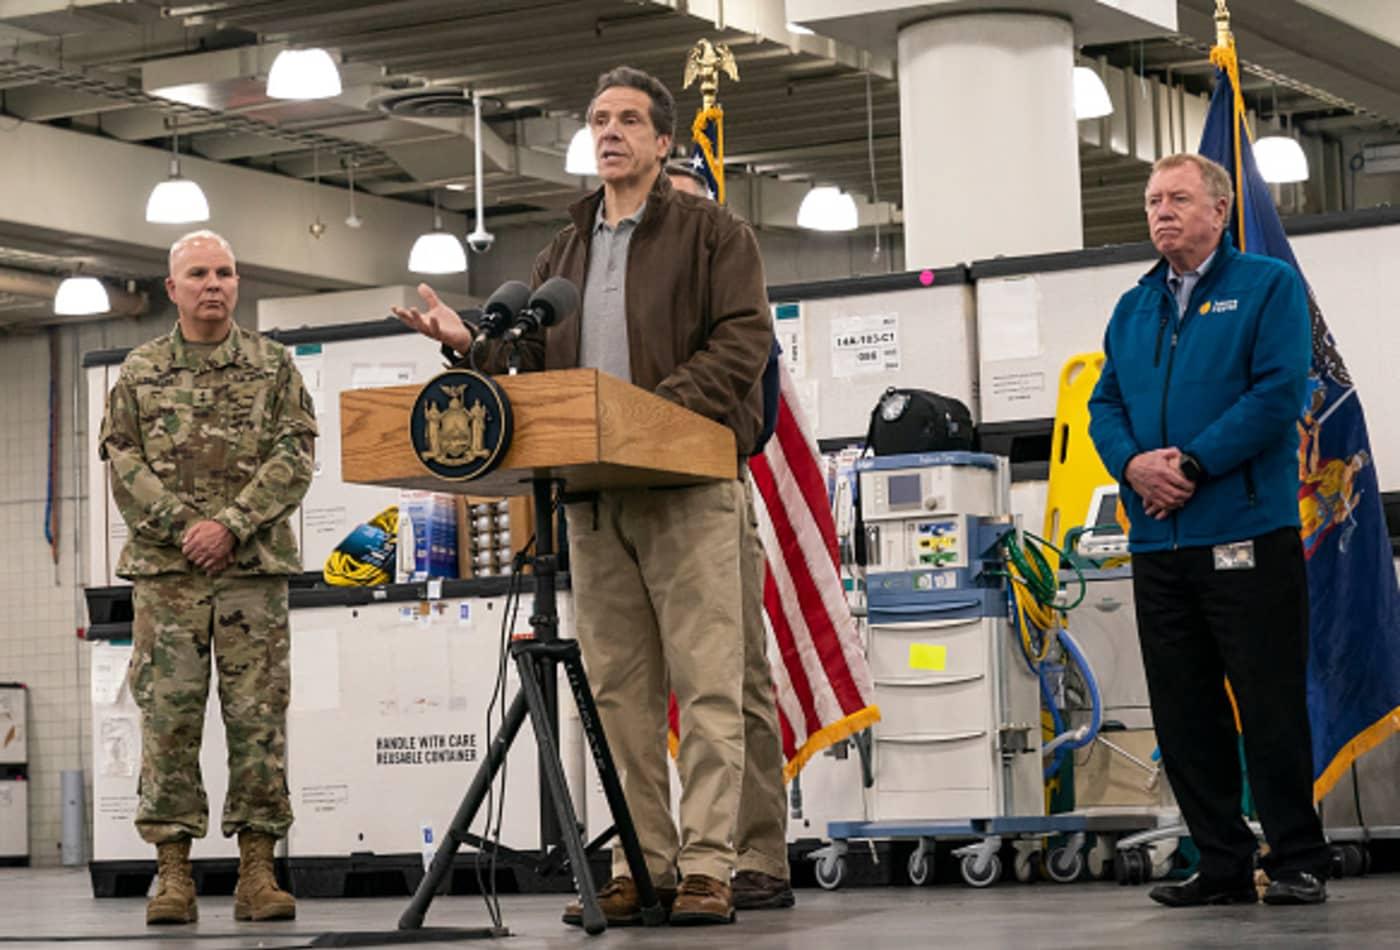 Coronavirus: Gov. Cuomo, the National Guard and FEMA transform the Javits Center into a hospital